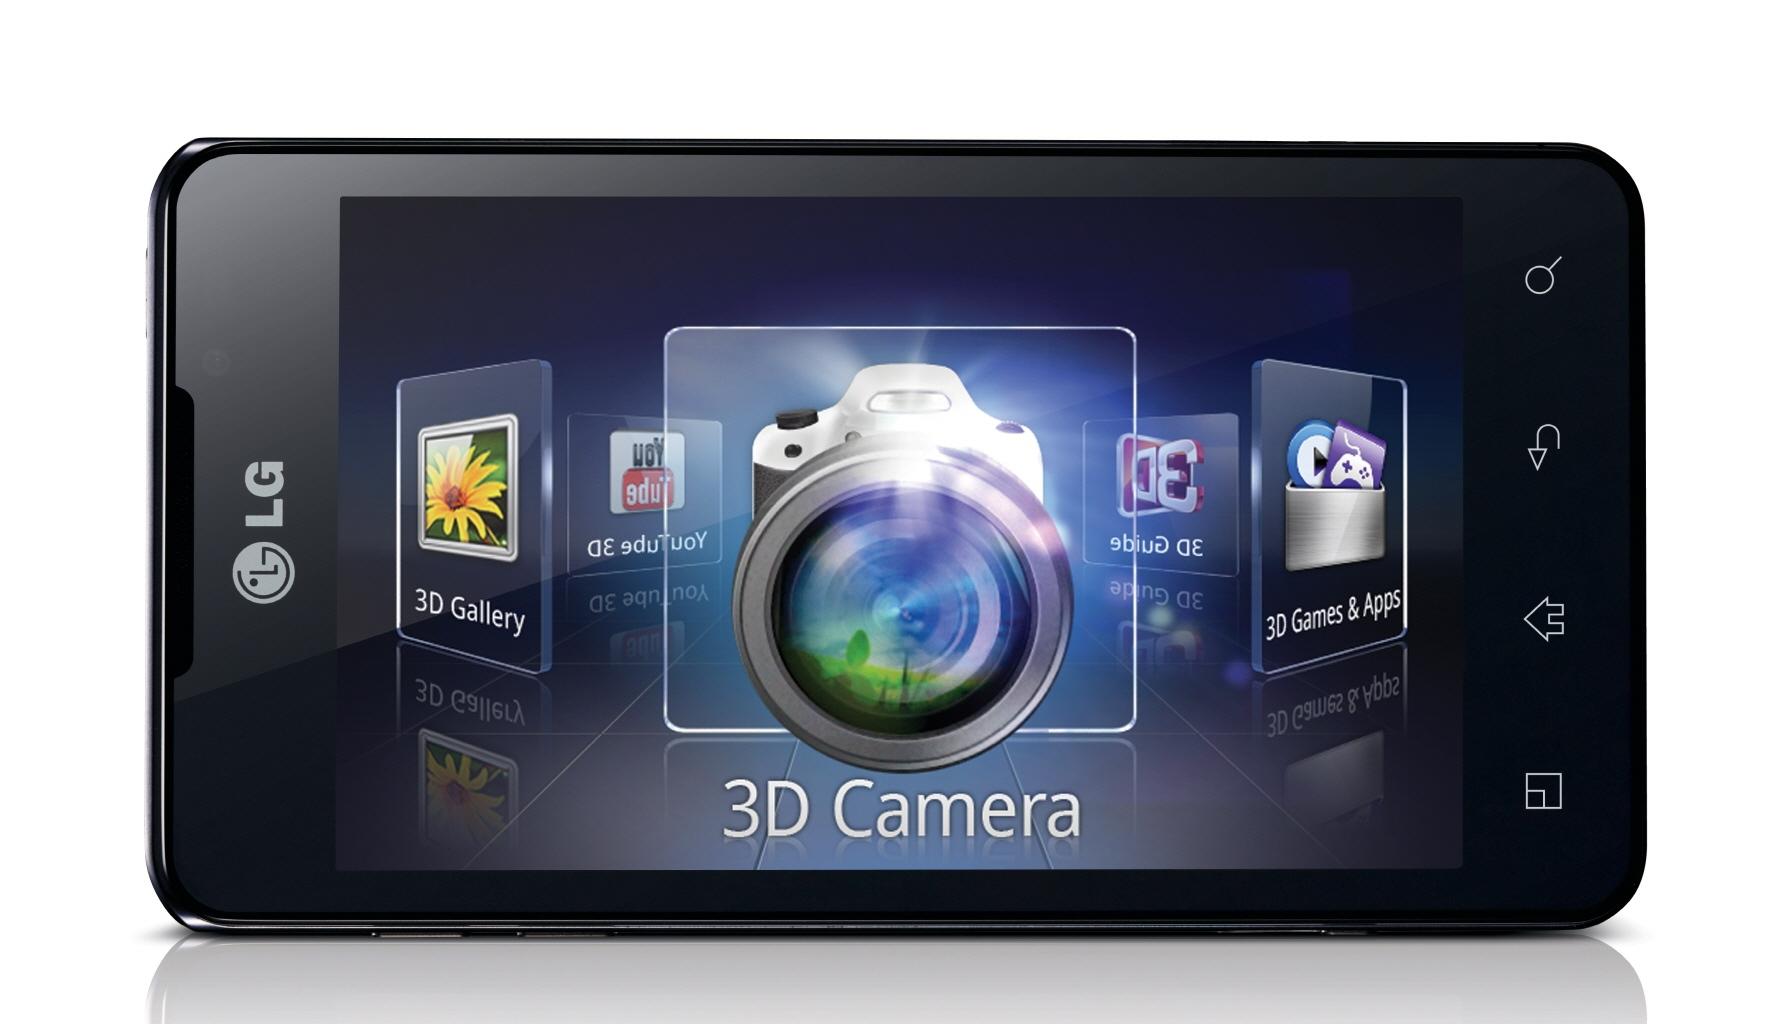 Offerte | LG Optimus 3D Max a 499€ da MediaWorld